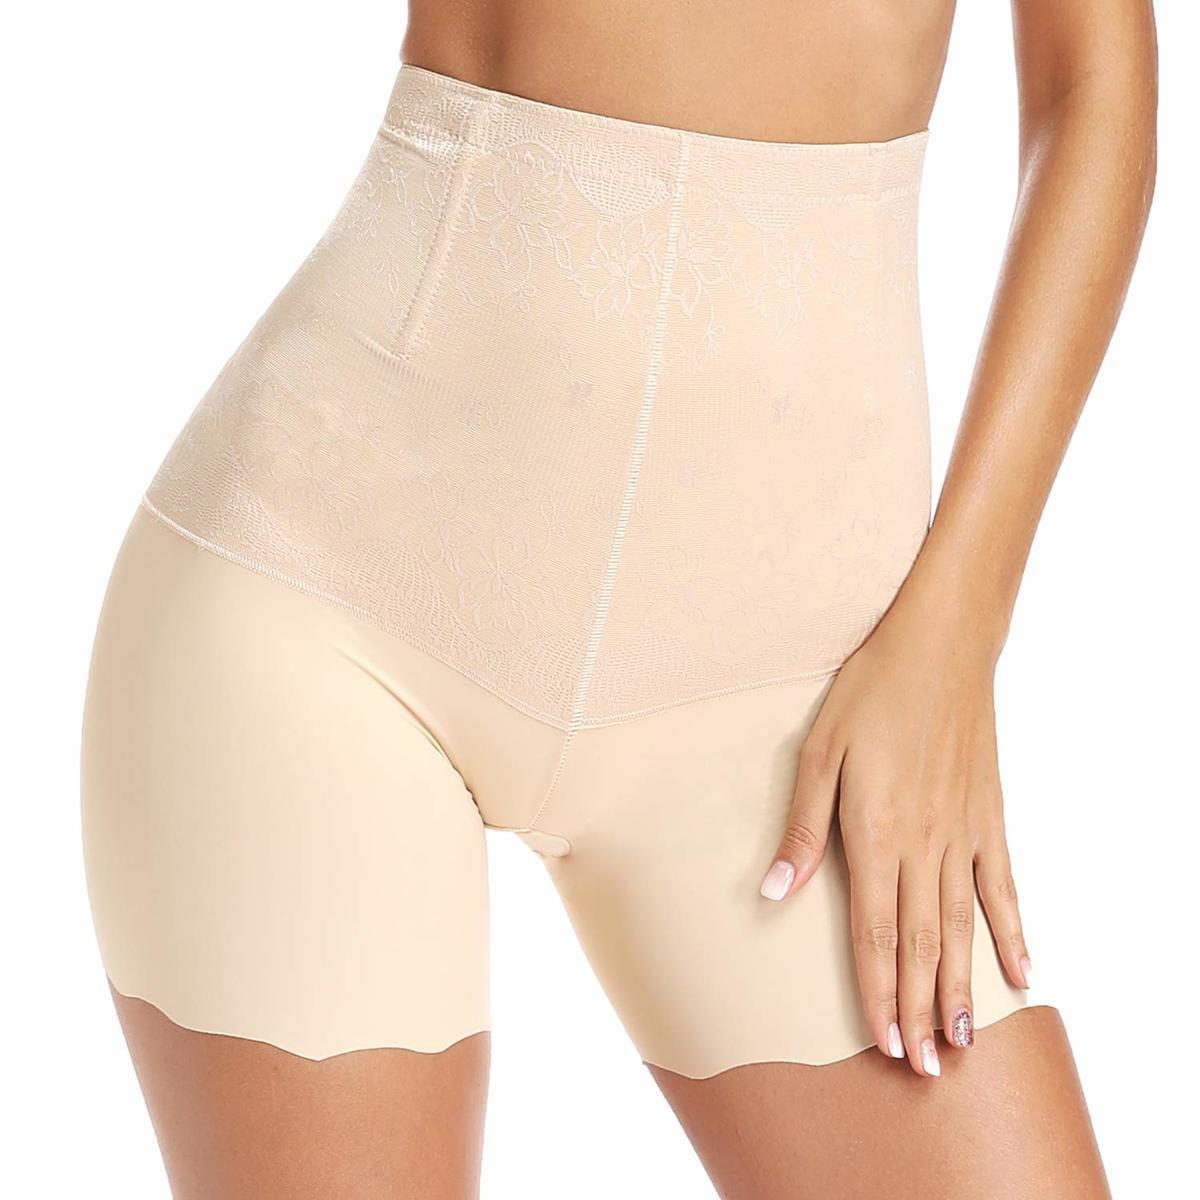 High Waist-Körper-Former-Frauen-Unterwäsche Taille Trainer Sicherheits kurze Hosen Kolben-Heber Shapewear Bauch-Steuer Gürtel Sexy Lingerie